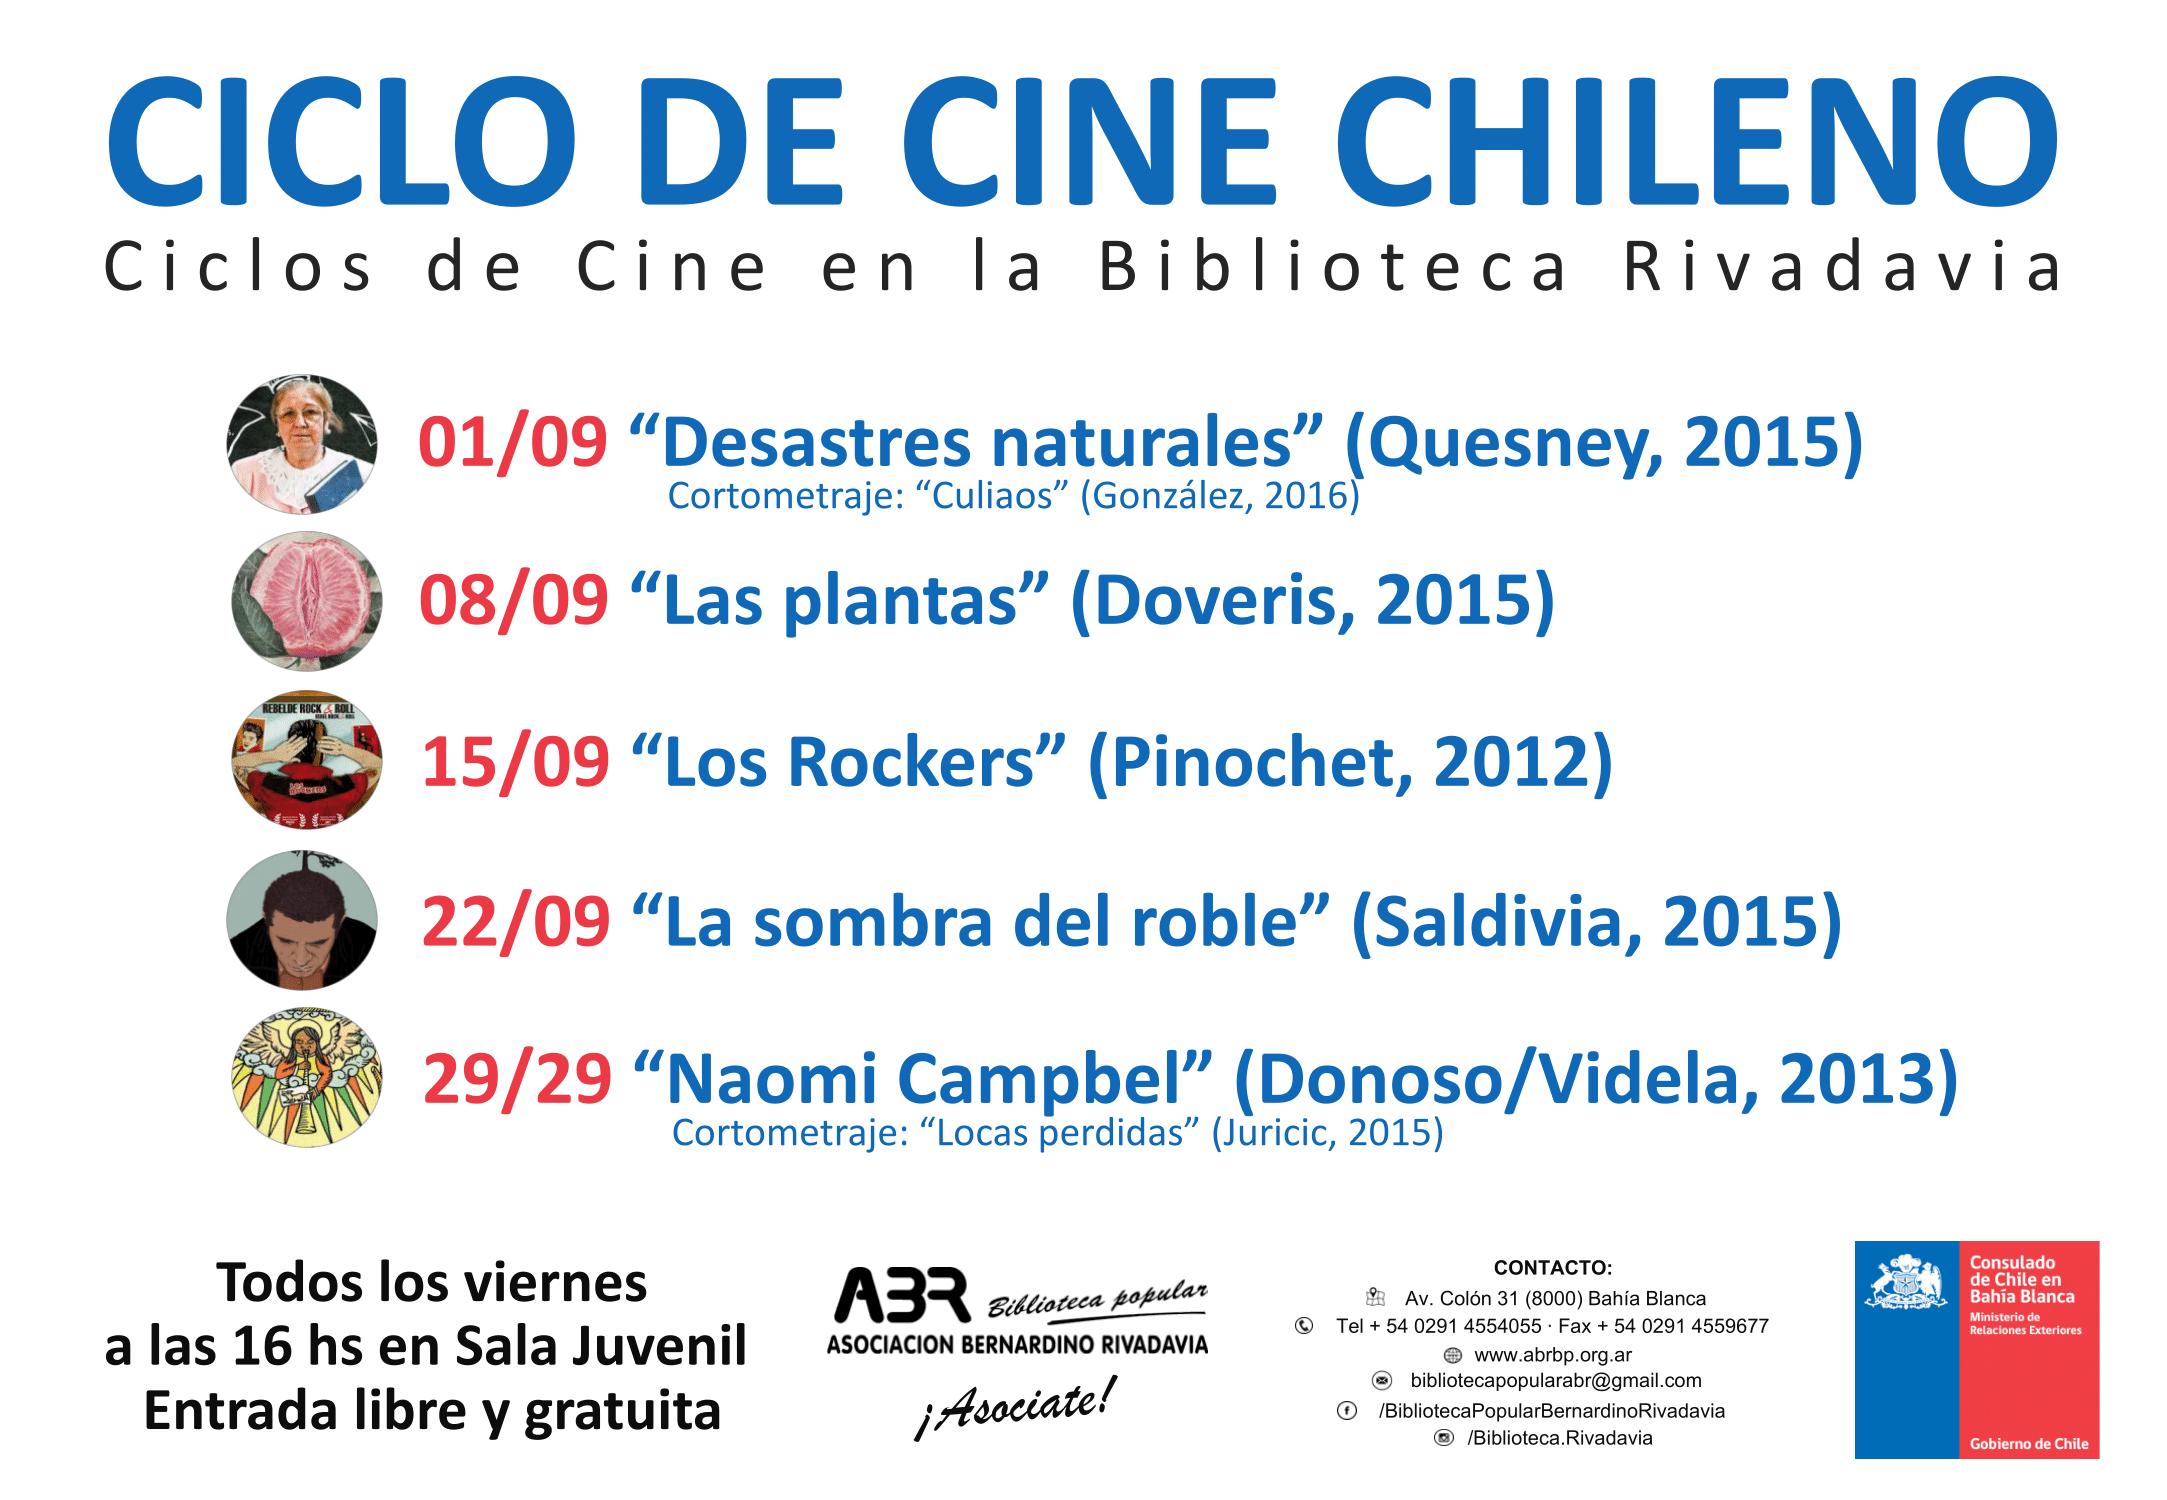 Ciclo de Cine Chileno - A4 - circ